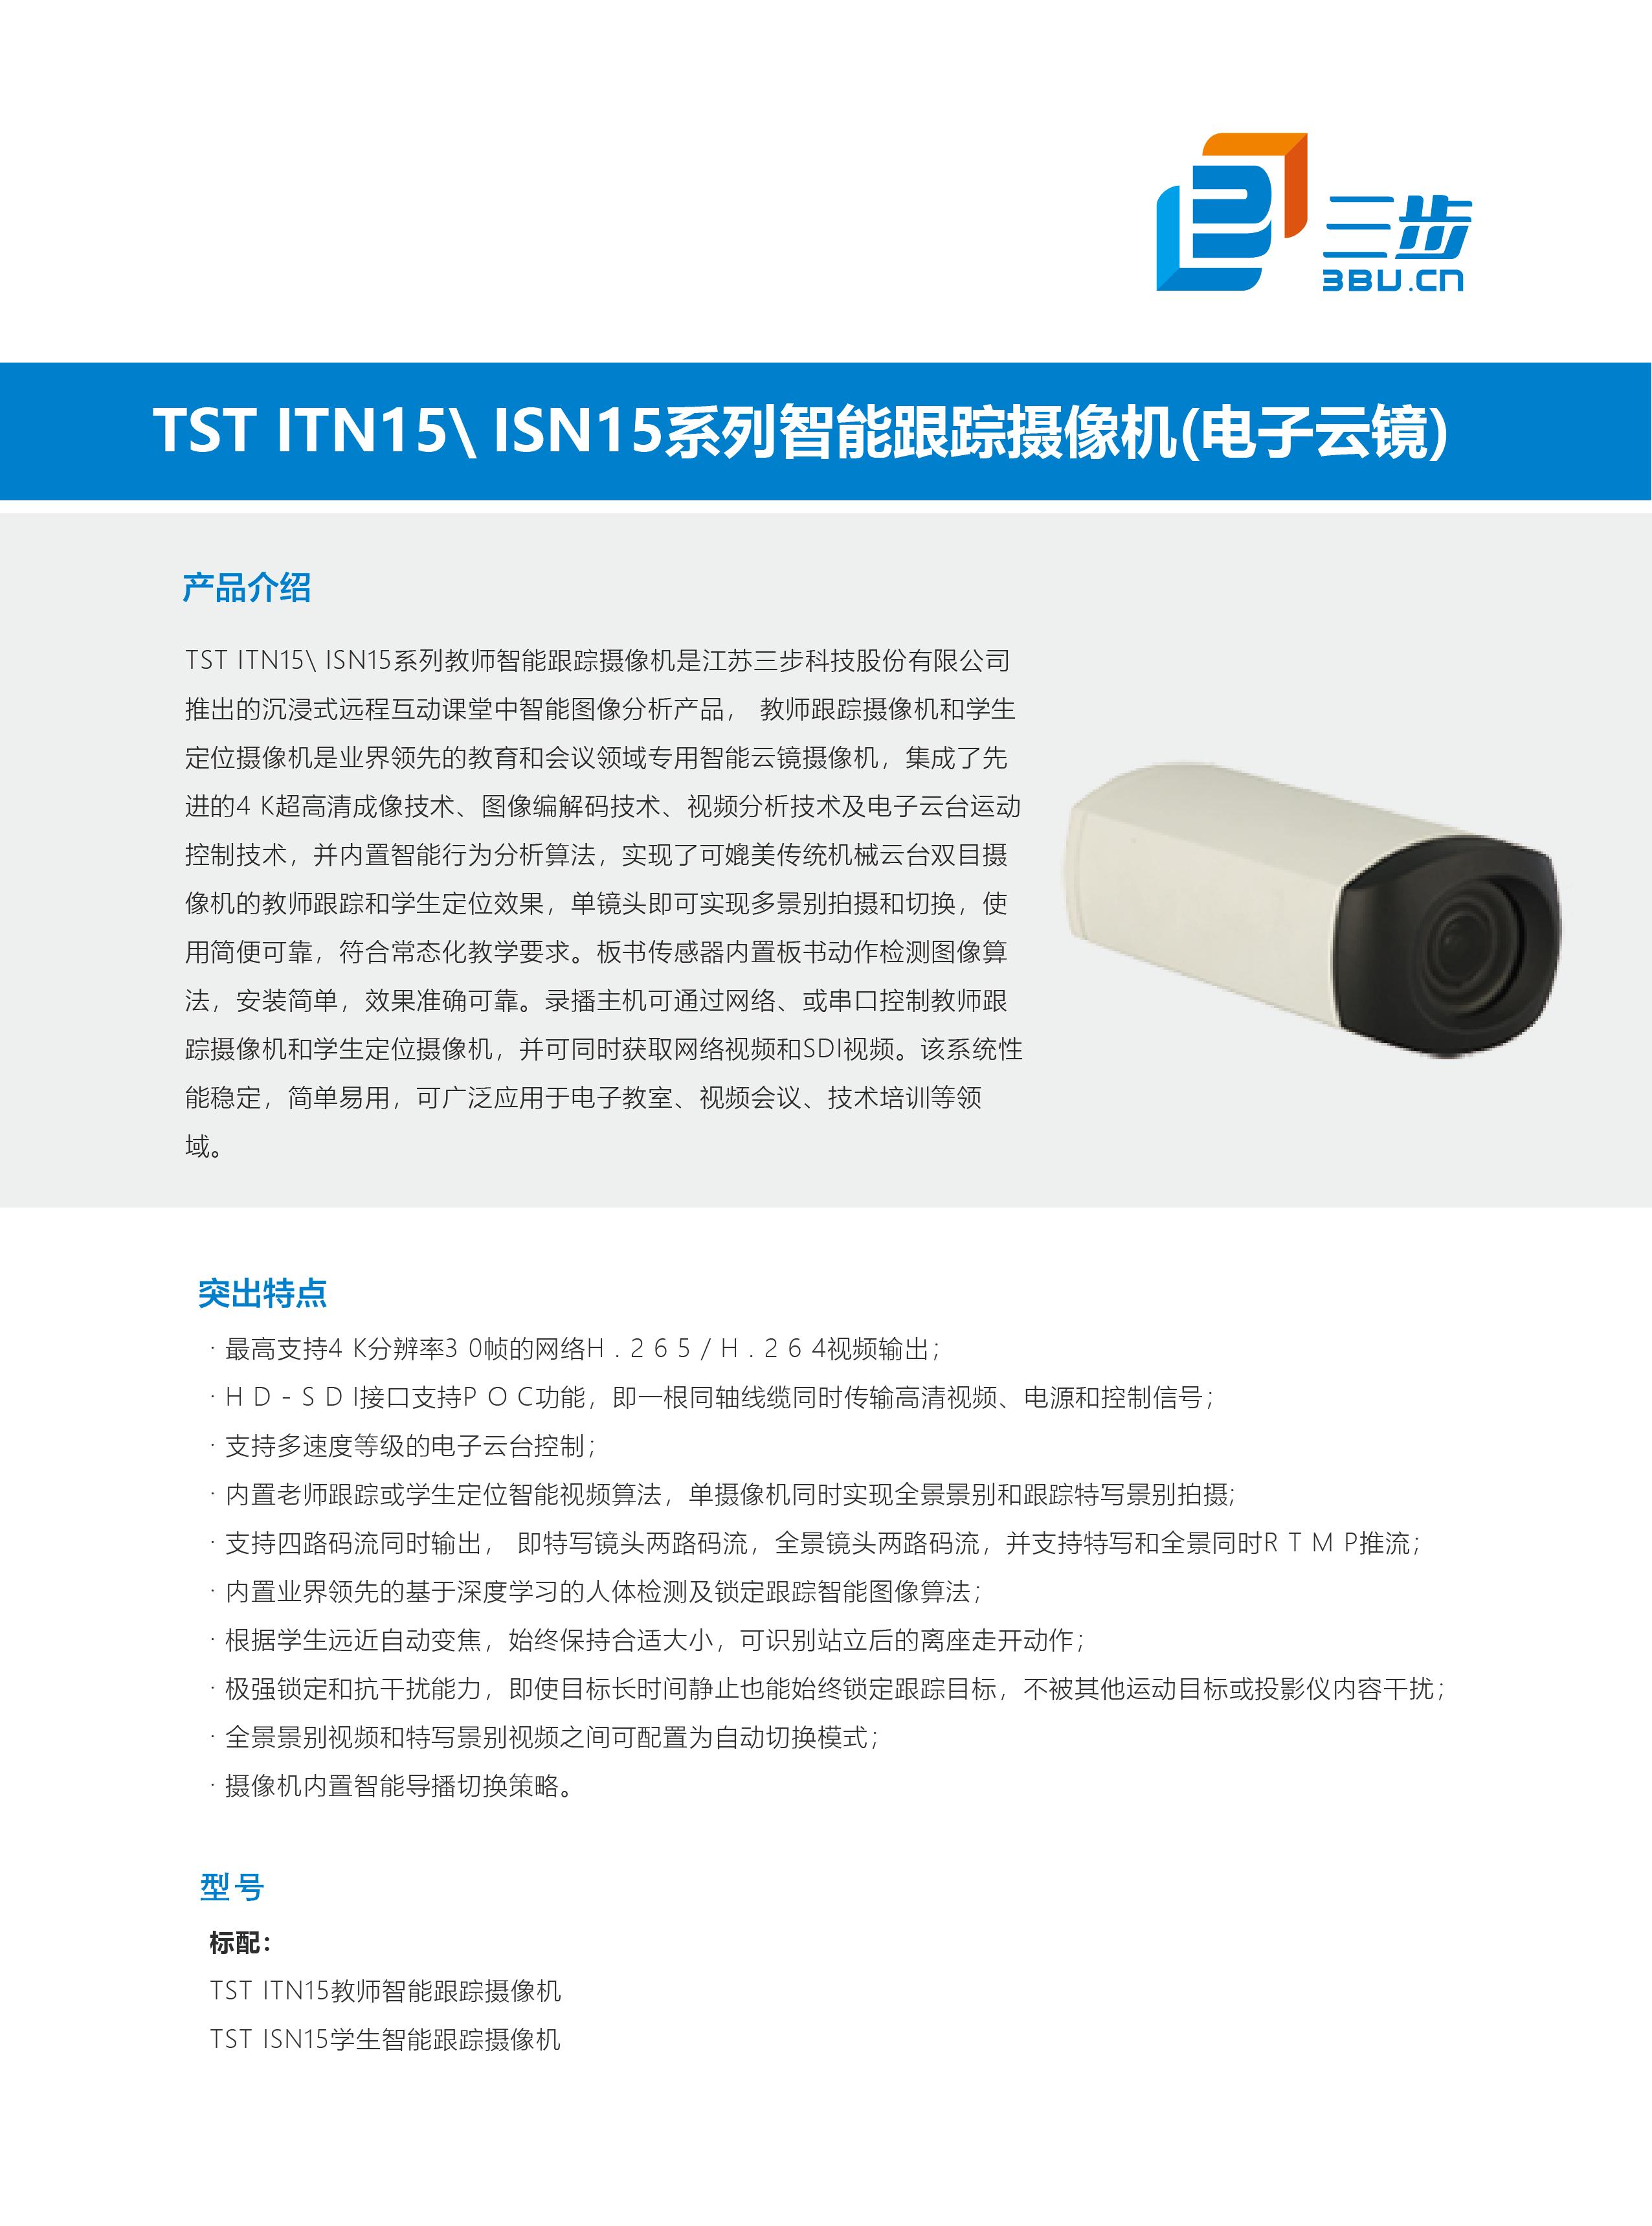 TST ISN15智能跟踪摄像机-01.png